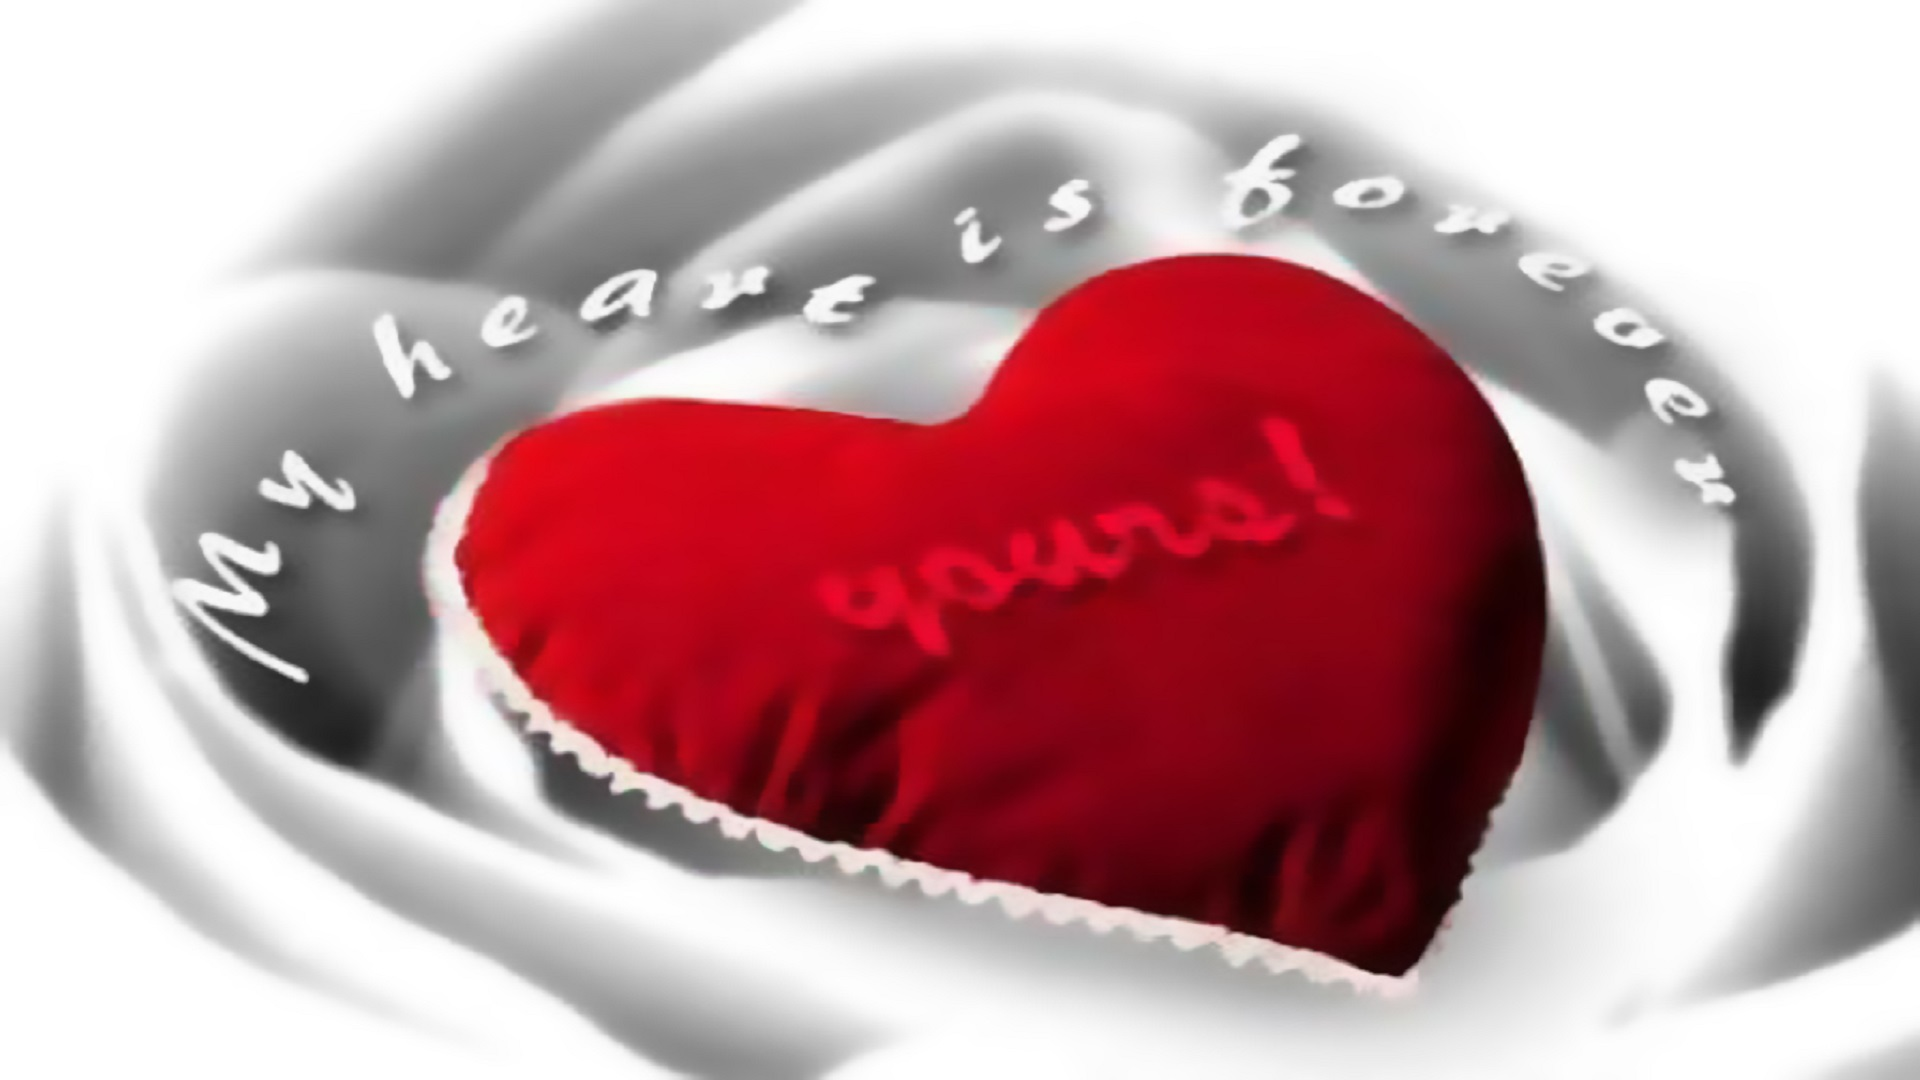 Cute Doll Wallpaper For Whatsapp Amzaing Love Forever Red Heart Wallpaper Hd Wallpaper